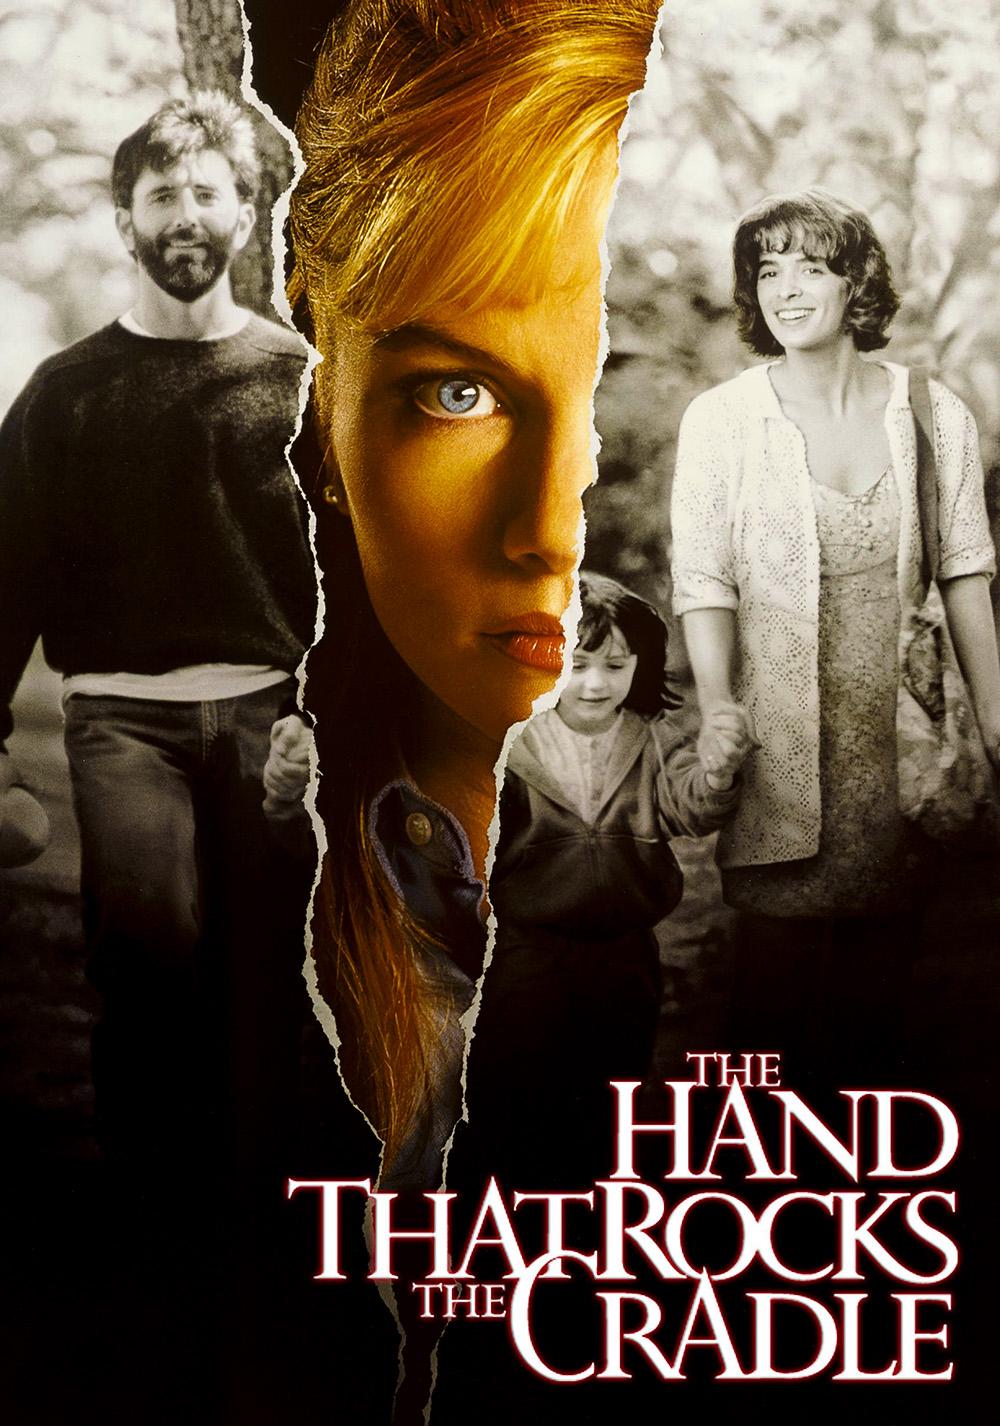 the-hand-that-rocks-the-cradle-567472b5b8d4e.jpg